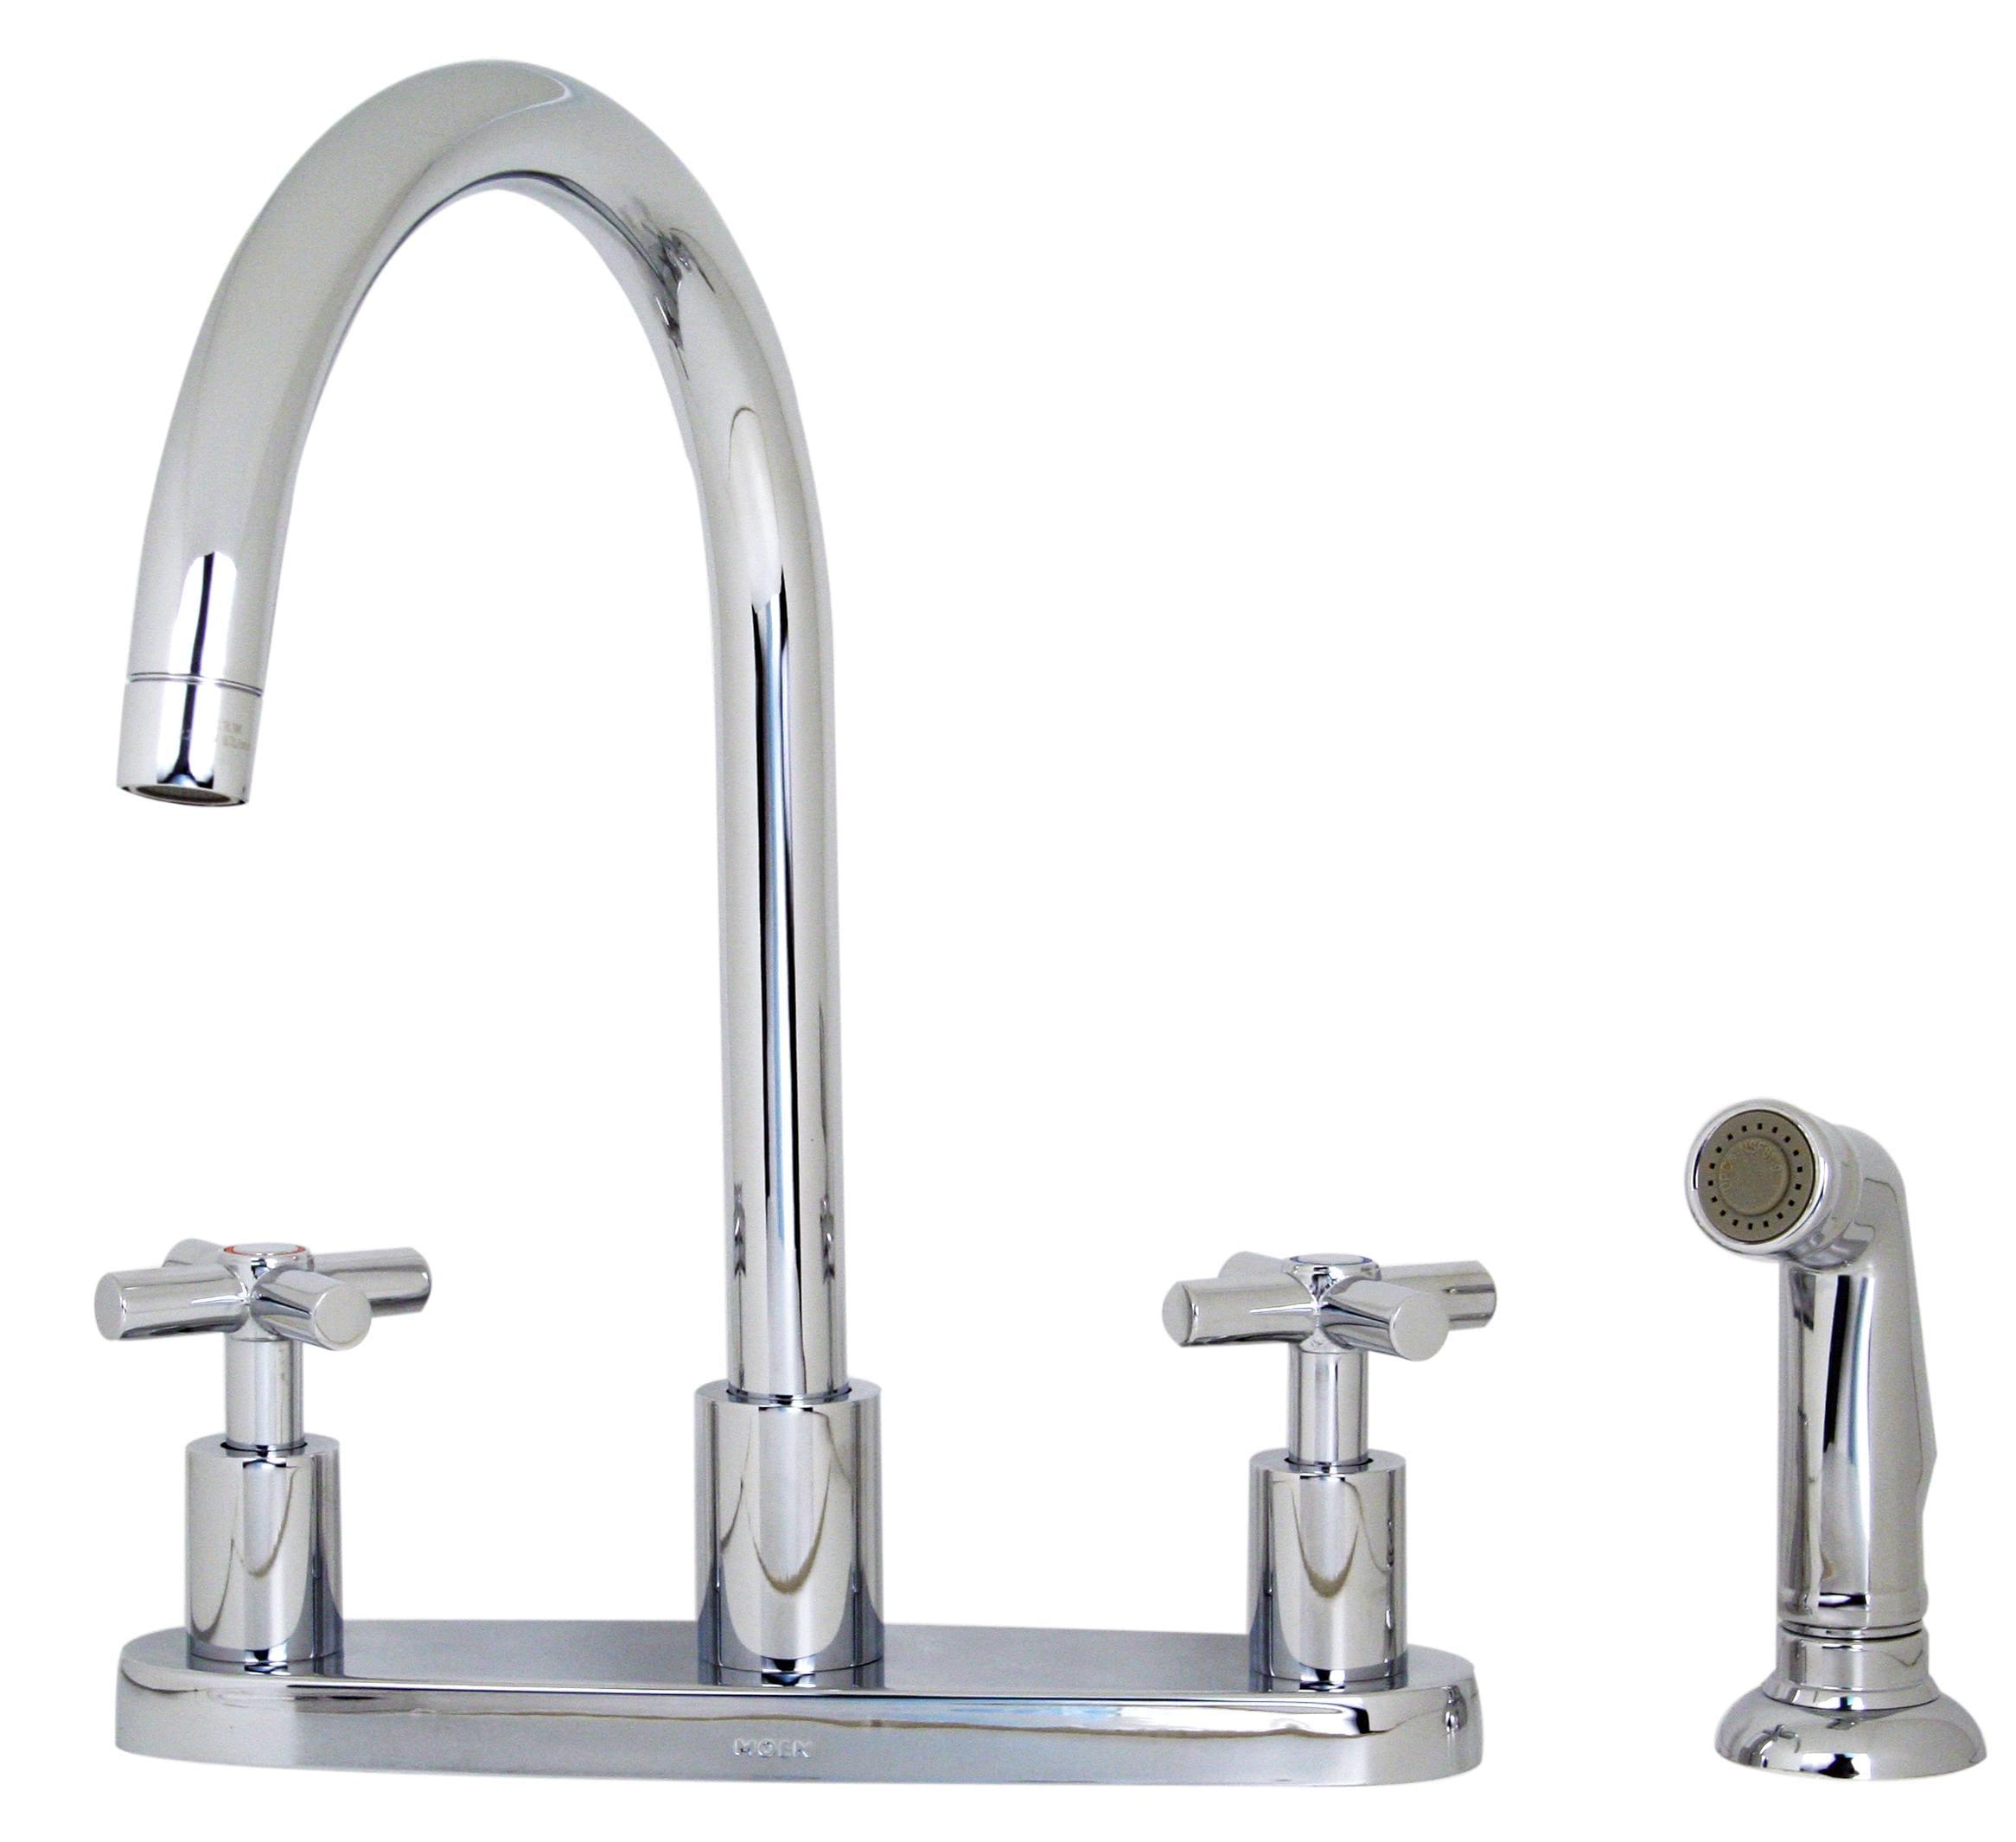 size bellera contemporary best of full dispenser kohler sink faucets soap faucet sprayer htsrec kitchen superb photos touch luxury com large